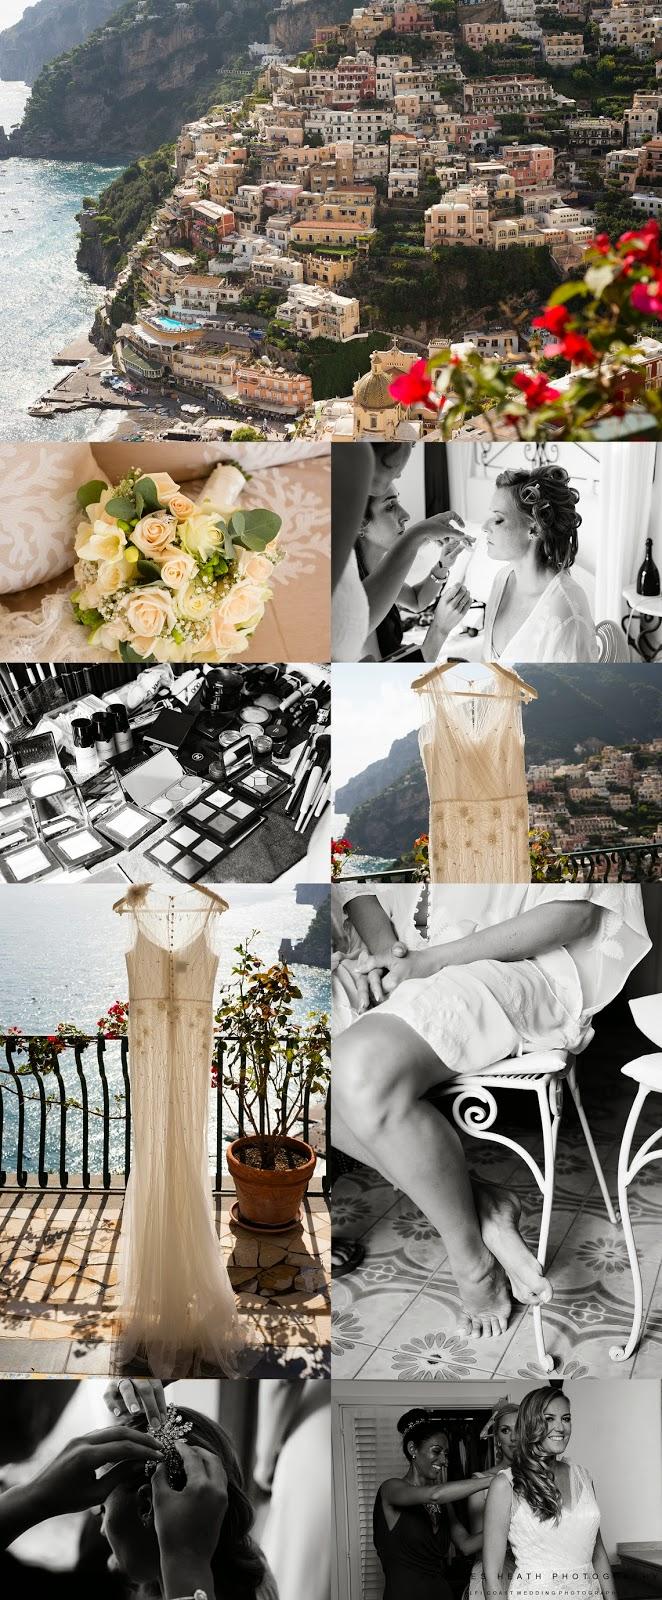 Bride getting ready at Villa Oliviero in Positano